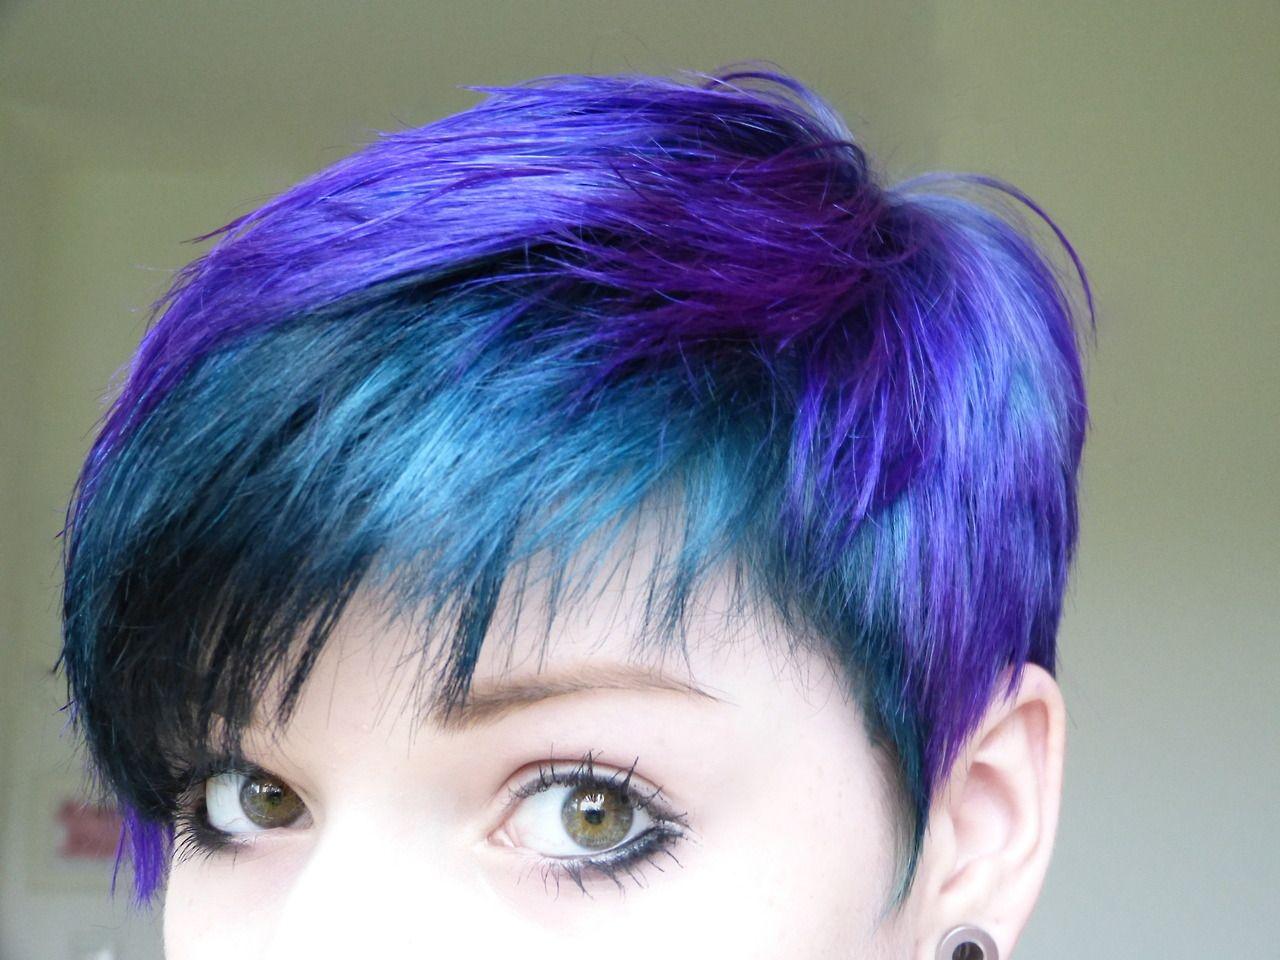 Short Pixie Blue And Purple Hair #haircut #hairstyle The